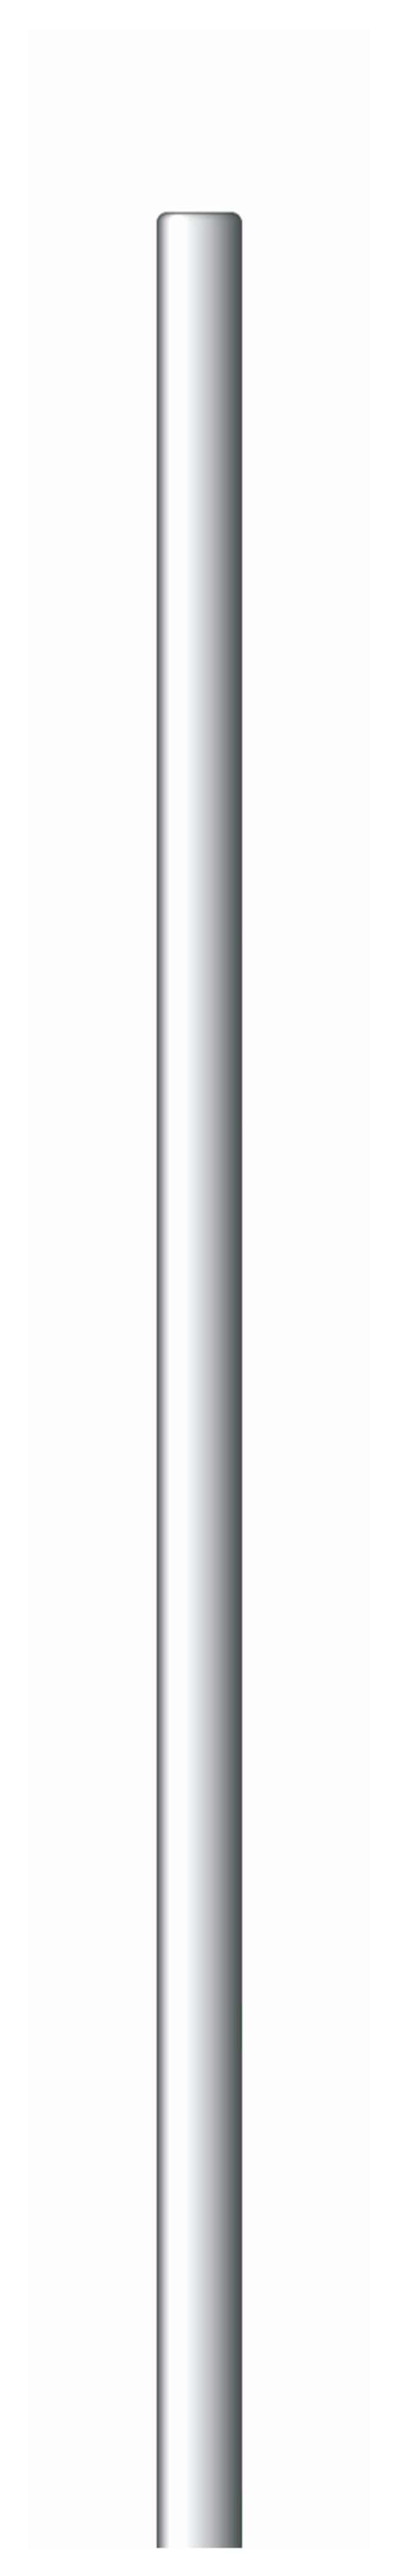 Trajan™LC Luer Lock Needles LC type tip; Length: 51mm; Gauge: 22; O.D.: 0.7mm; I.D.: 0.37mm Trajan™LC Luer Lock Needles